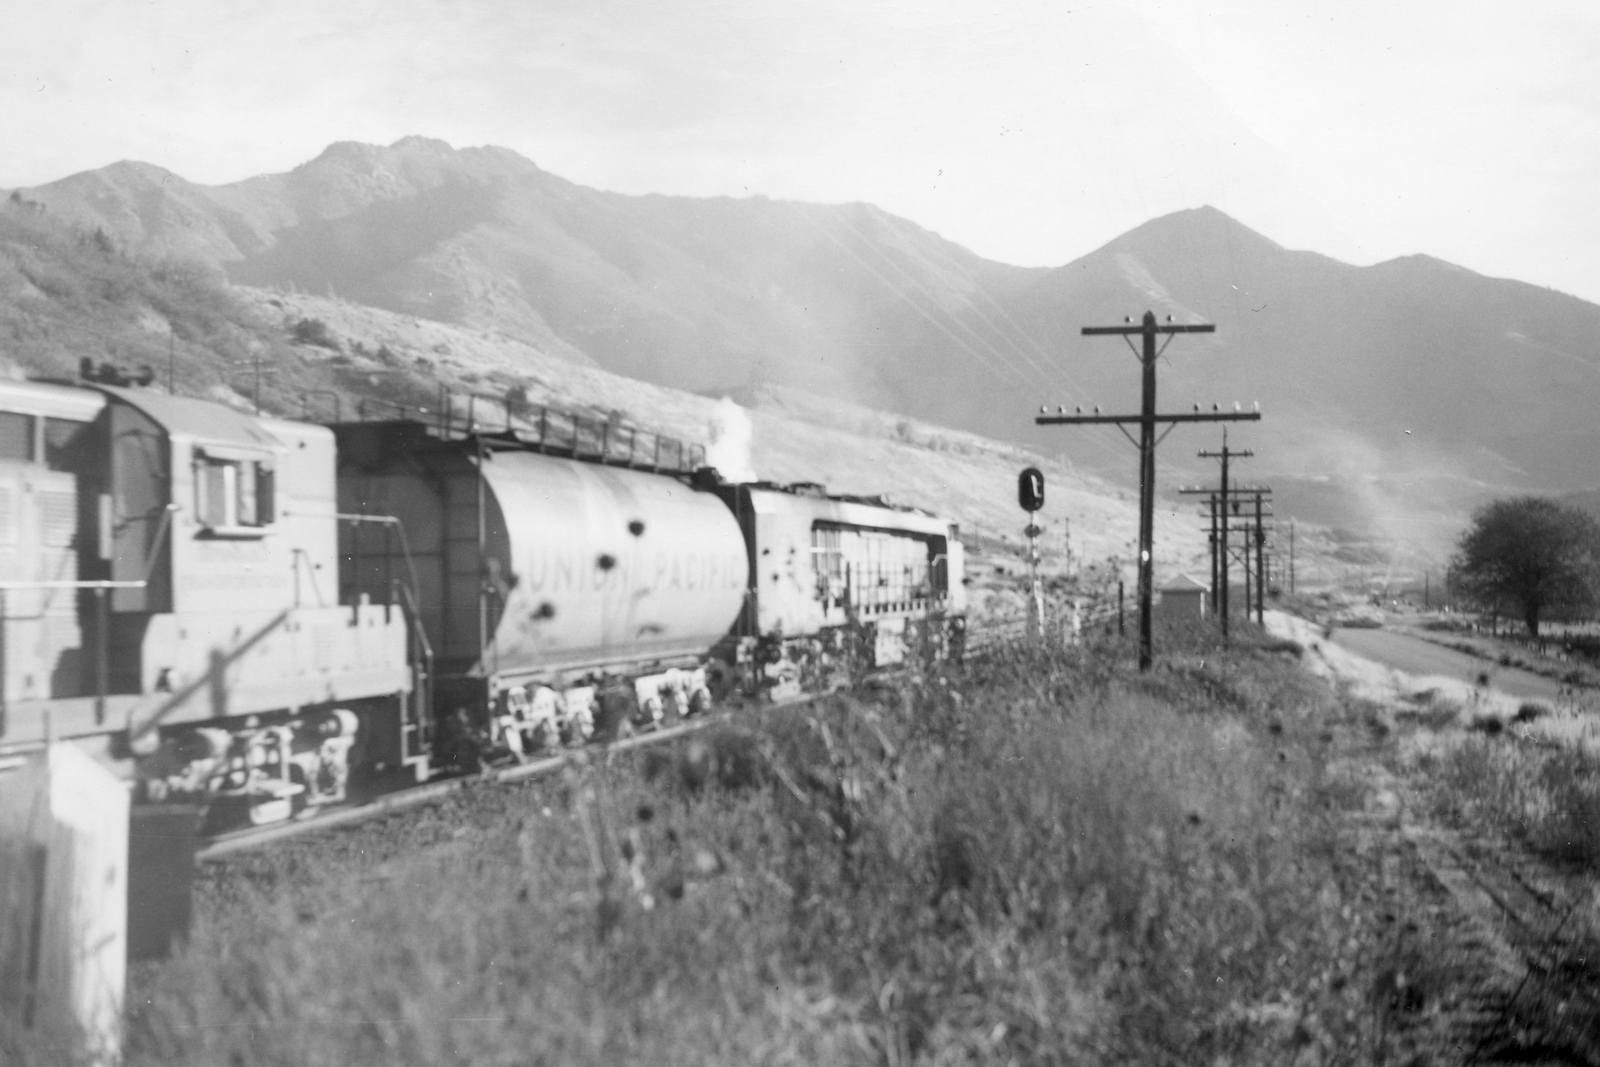 UP_turbine_70-with-train-rear_Uintah_Dave-England-photo